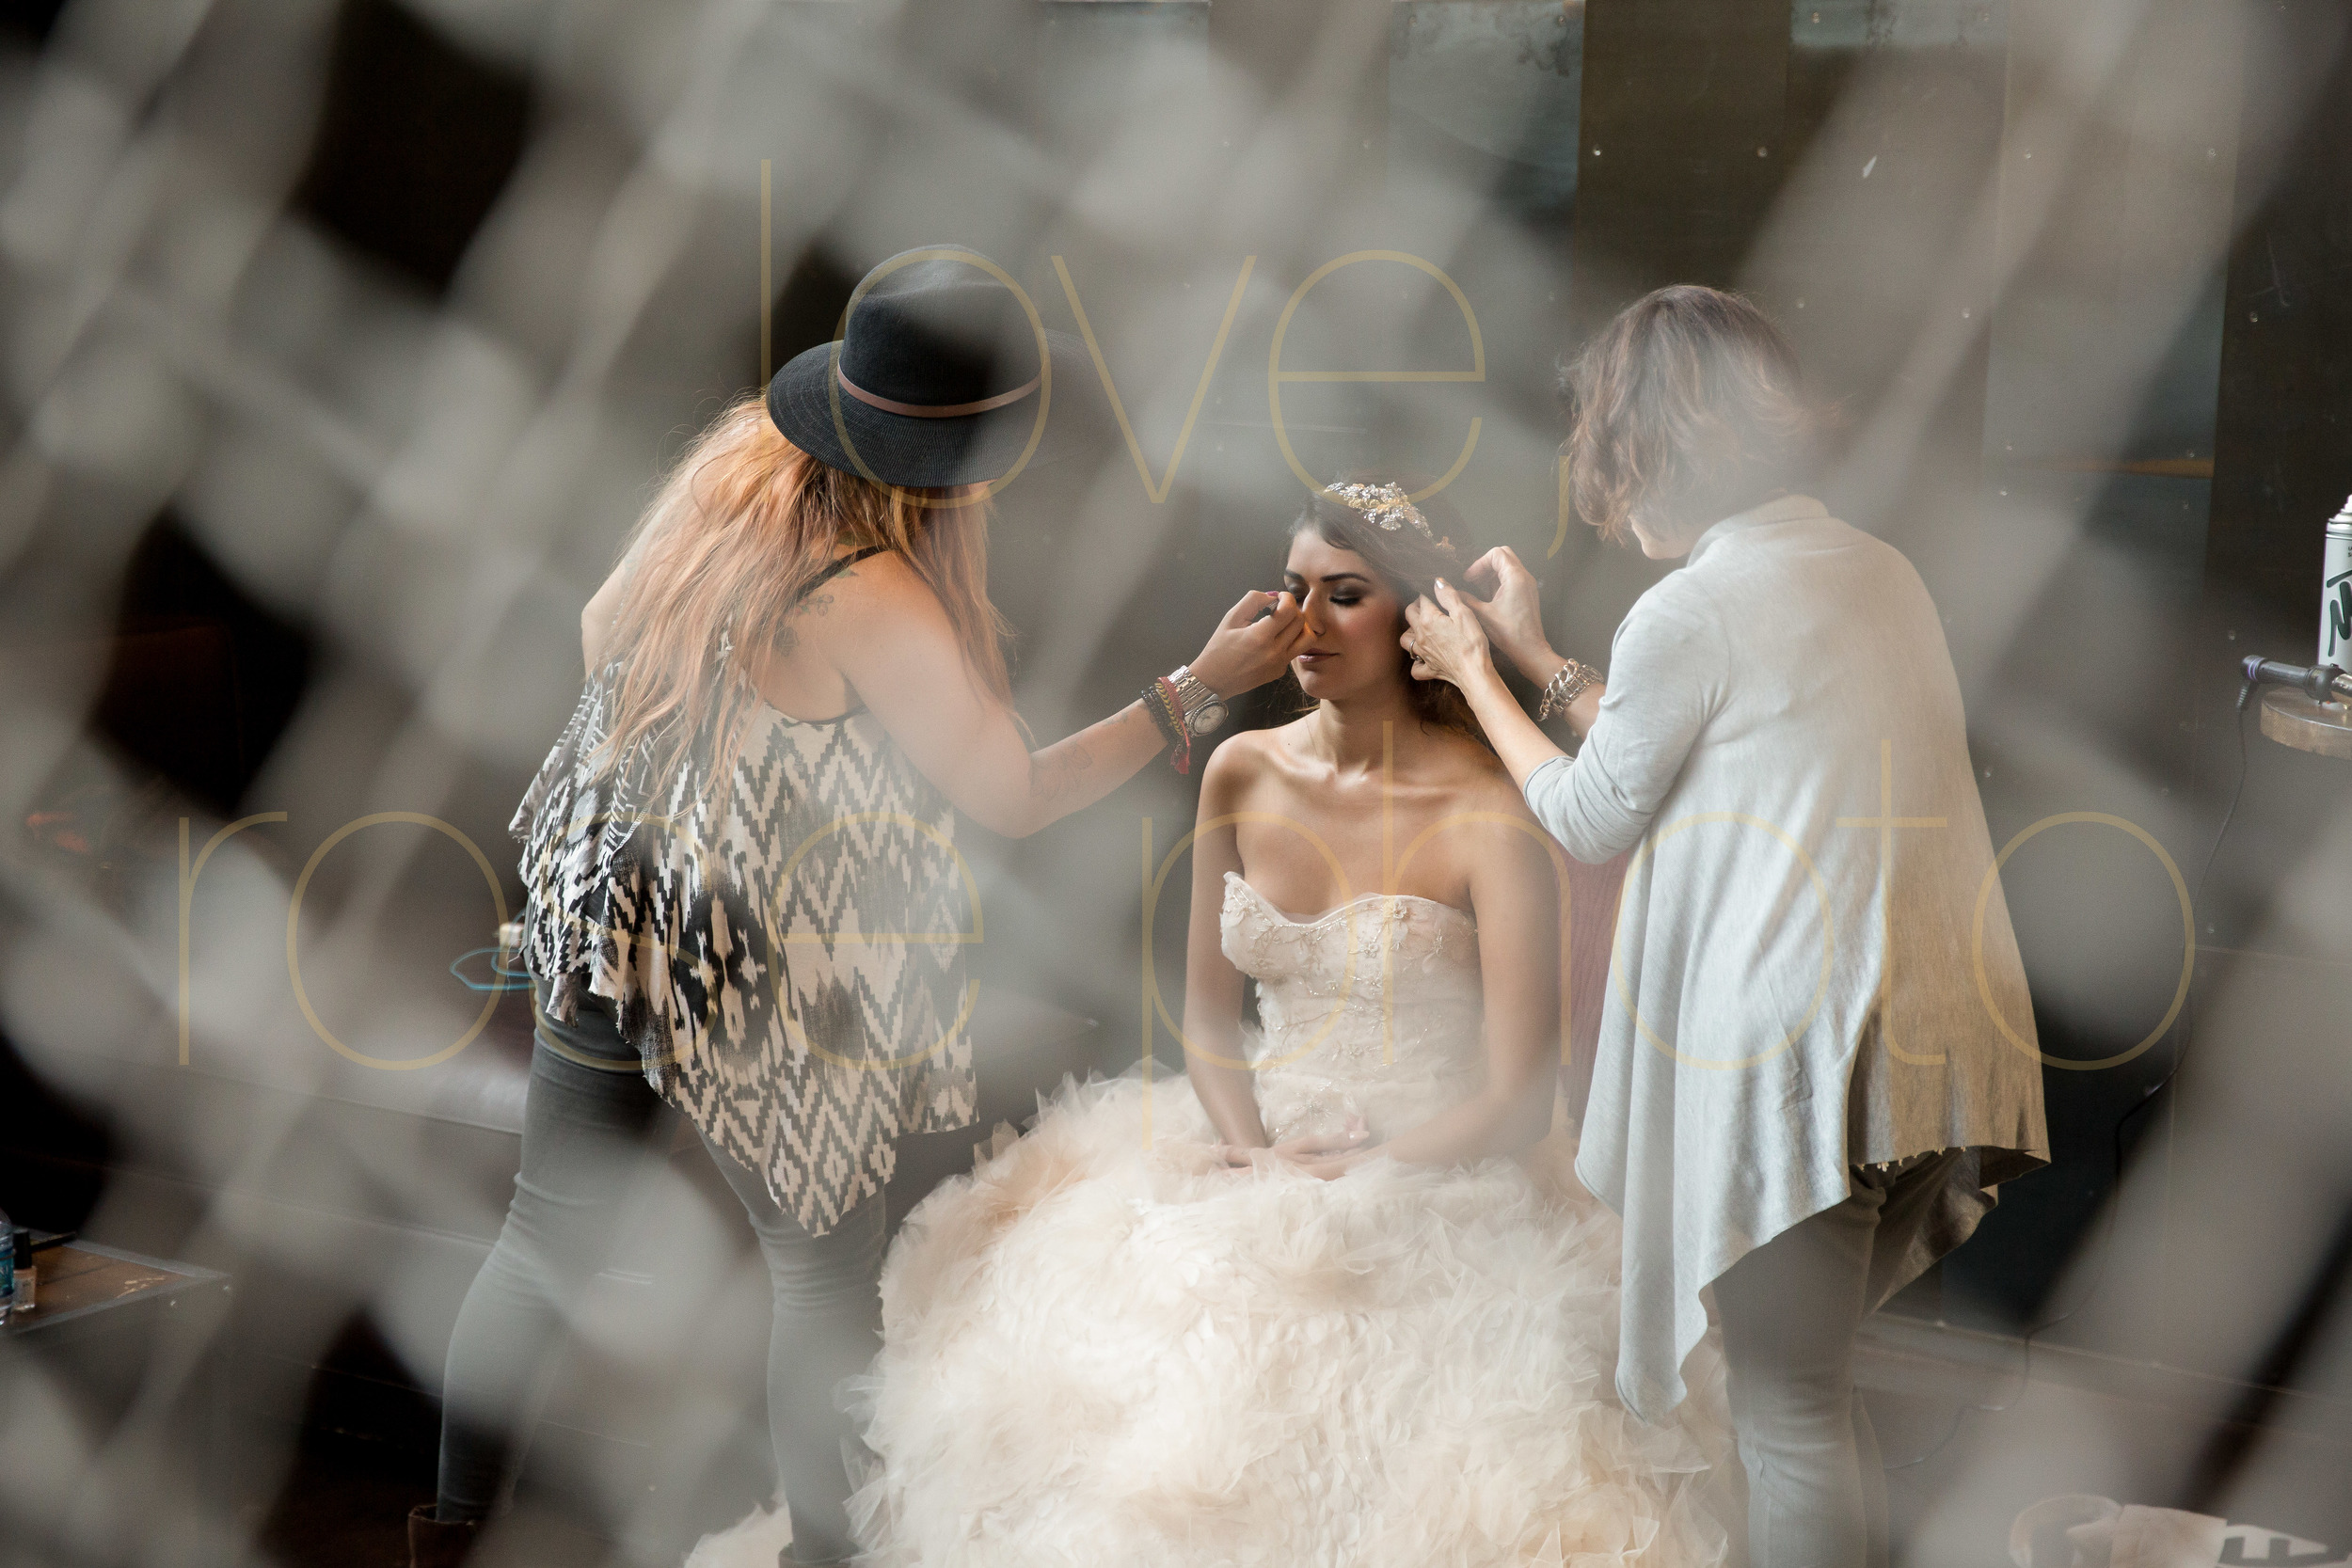 Morgan MFG West Loop Chicago Wedding Venue Photography Portrait Photographer -14.jpg